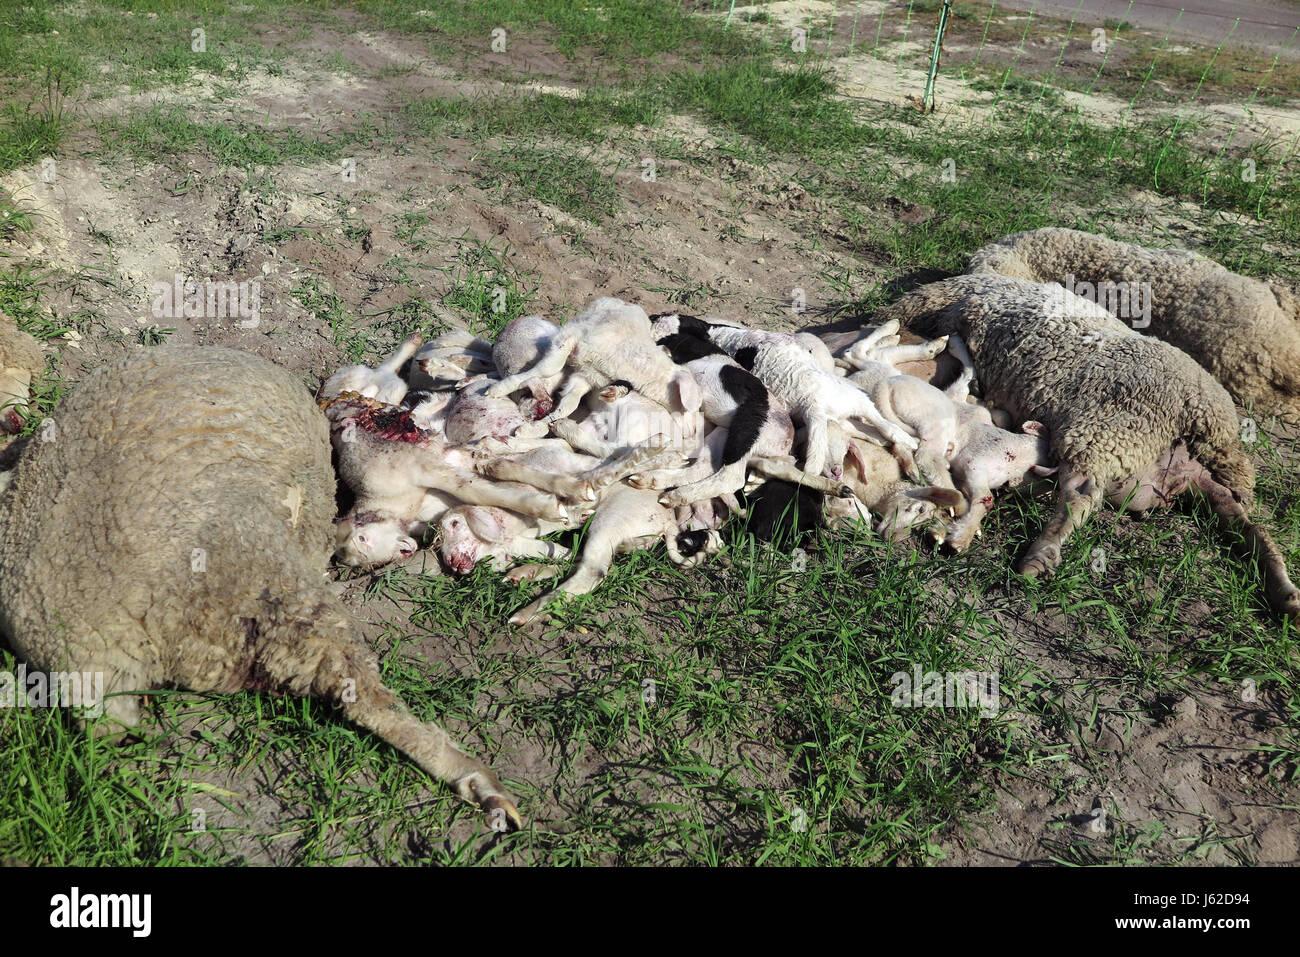 Kummersdorf, Germany. 18th May, 2017. Killed sheep lie on a maeadow in Kummersdorf, Germany, 18 May 2017. Shepherd Stock Photo